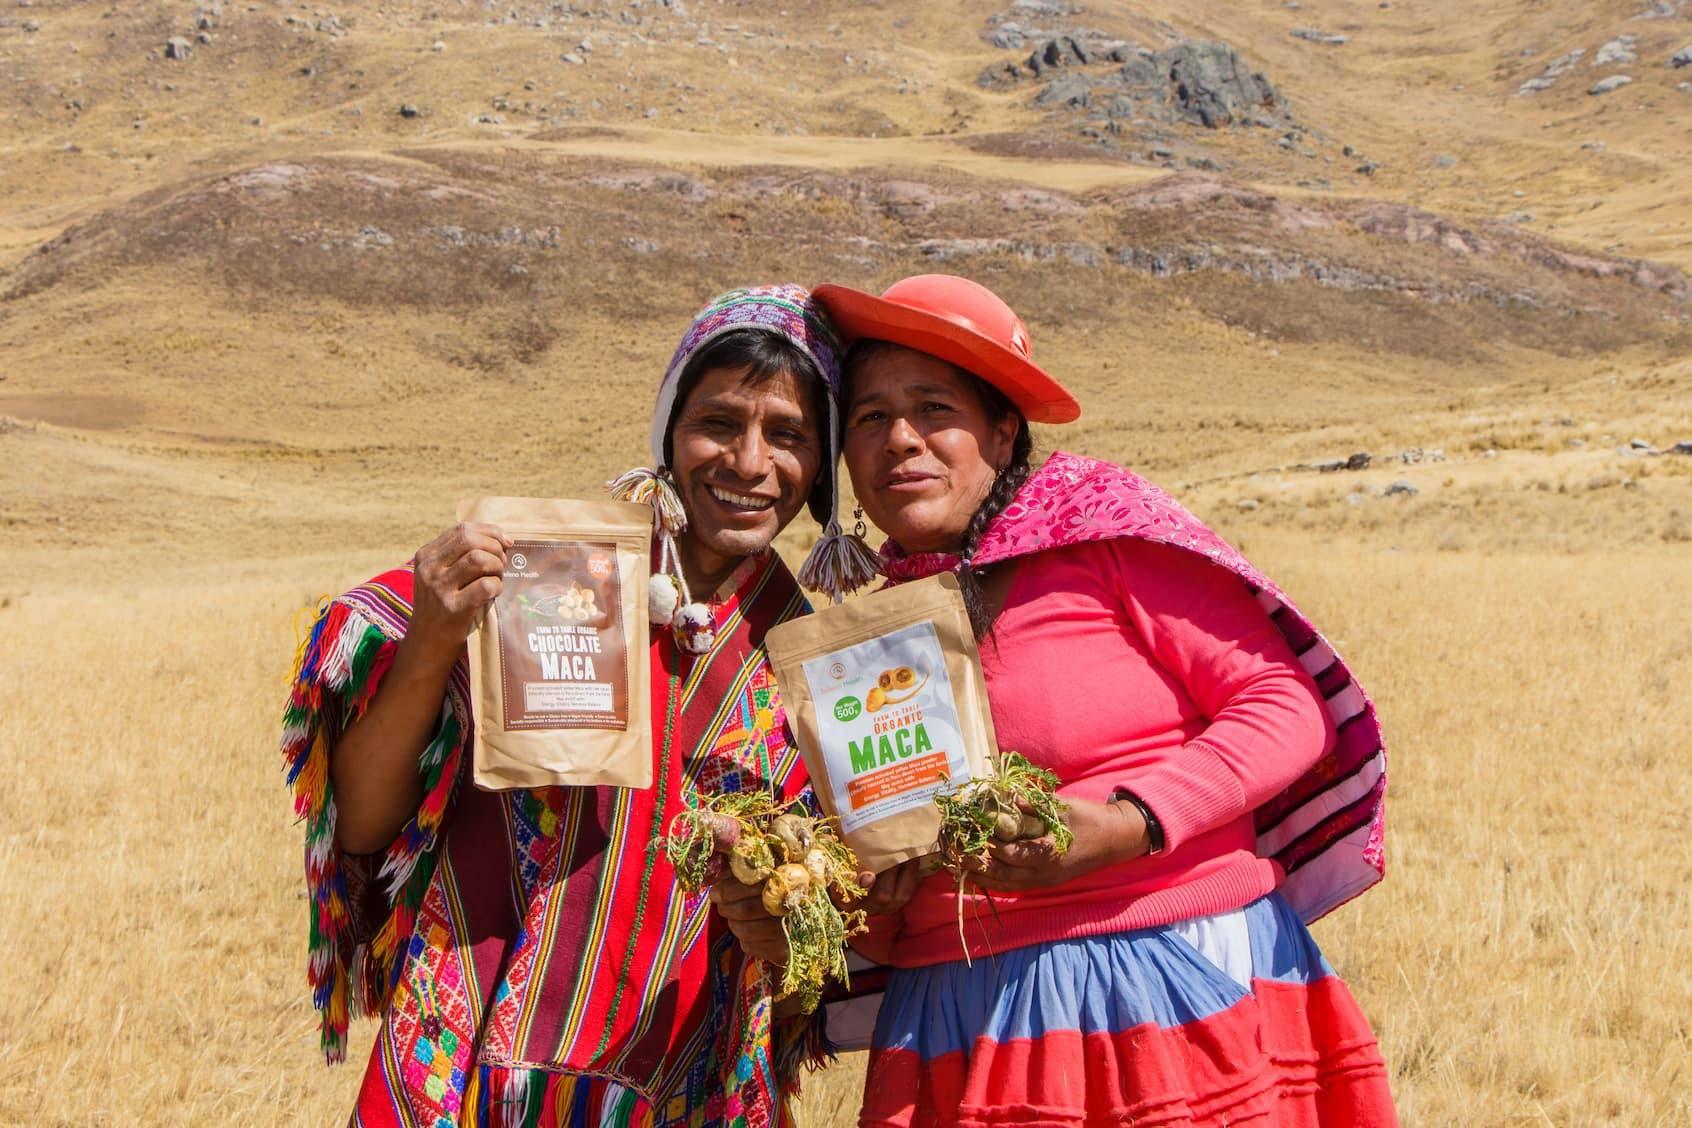 Corin Storkey Organic Maca Powder Activated Maca NZ